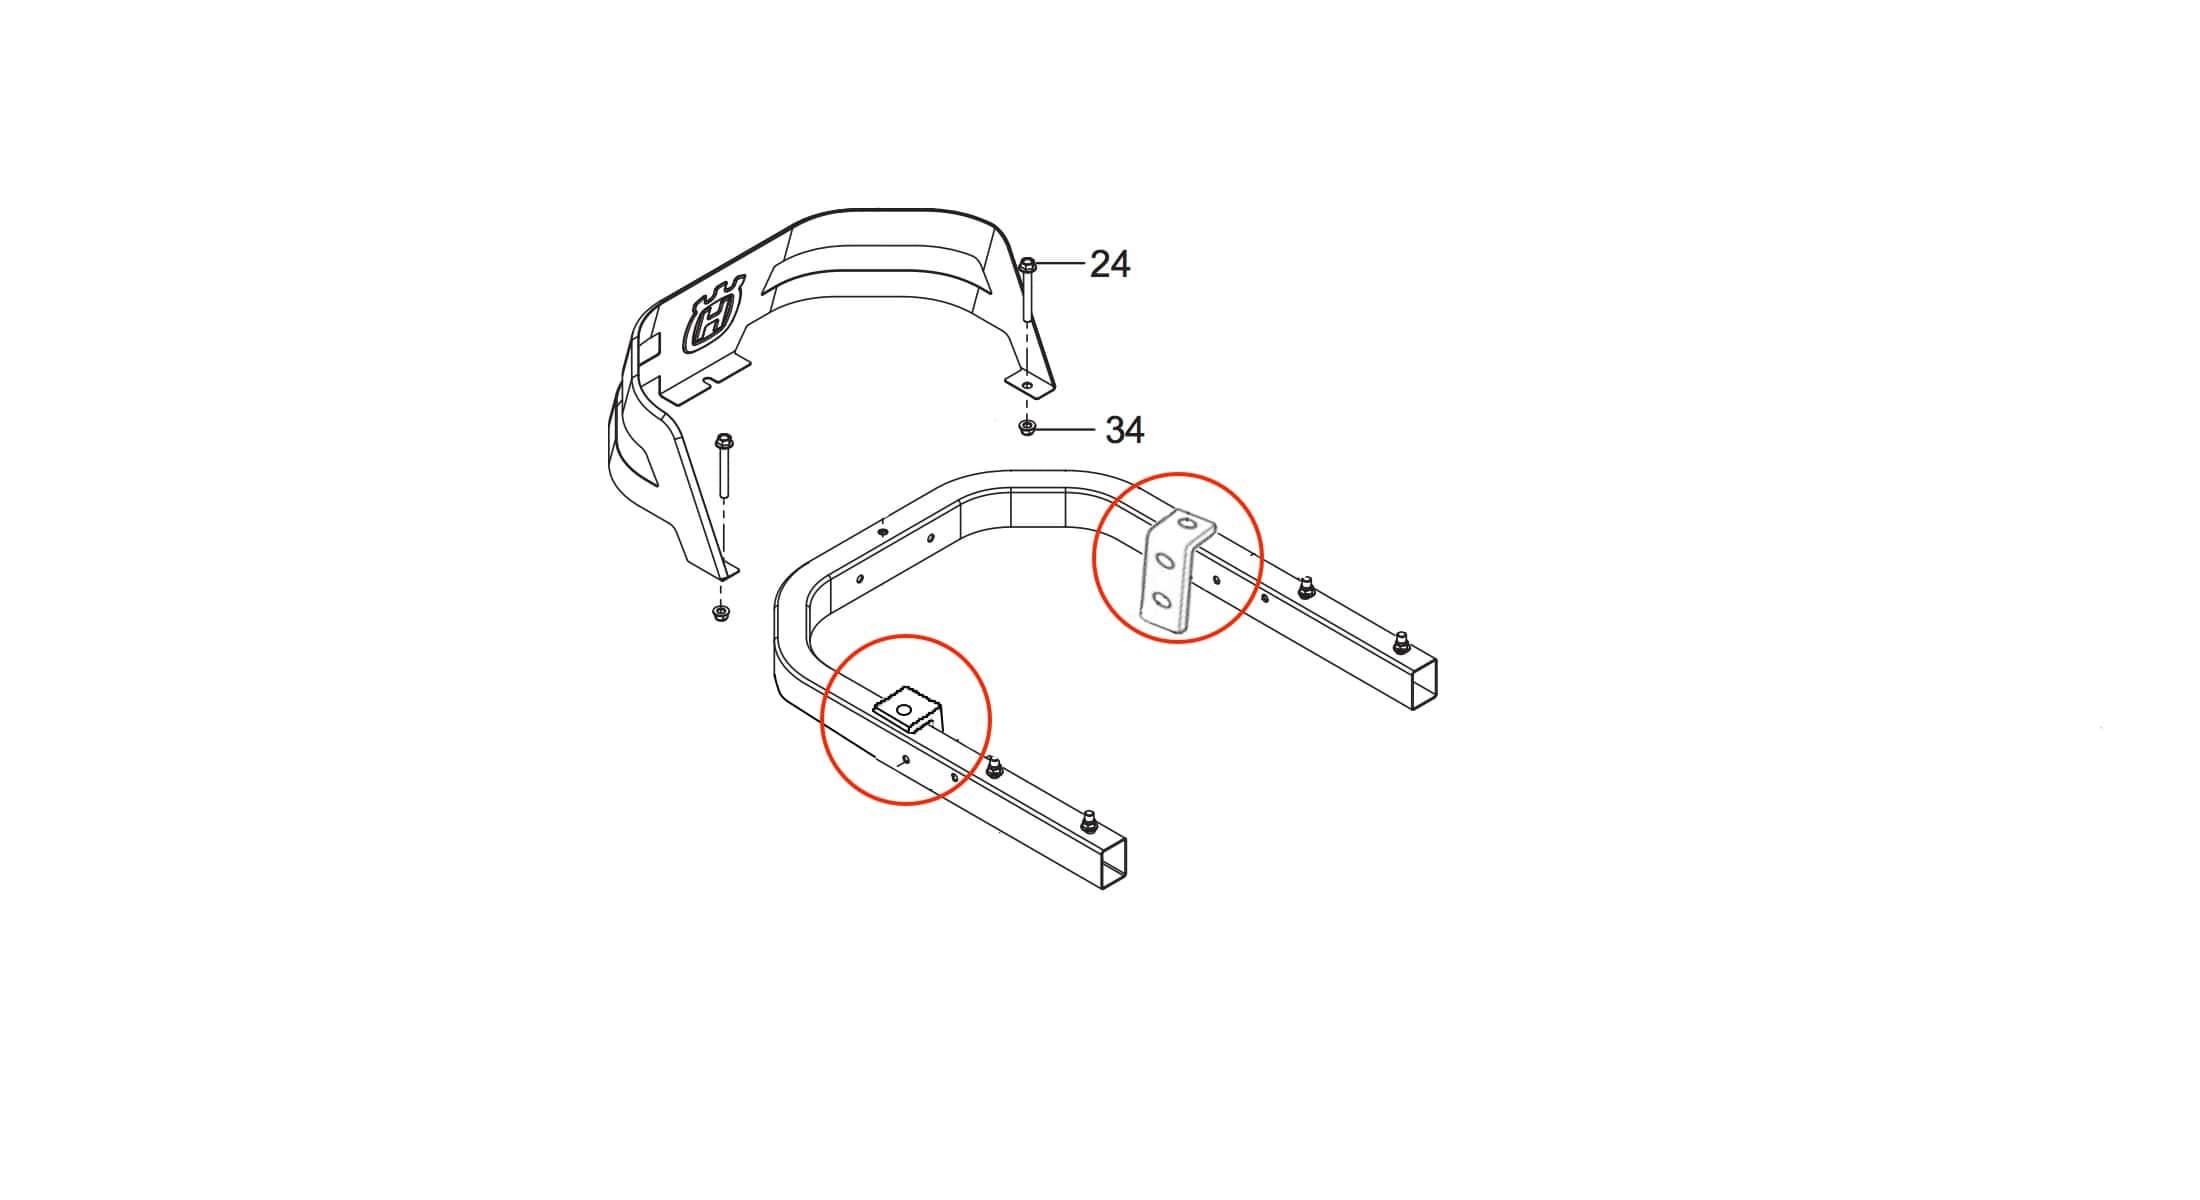 Checkmate Lawn Striper For Husqvarna Z200 Series Tractor Wiring Diagram Installation Schematic